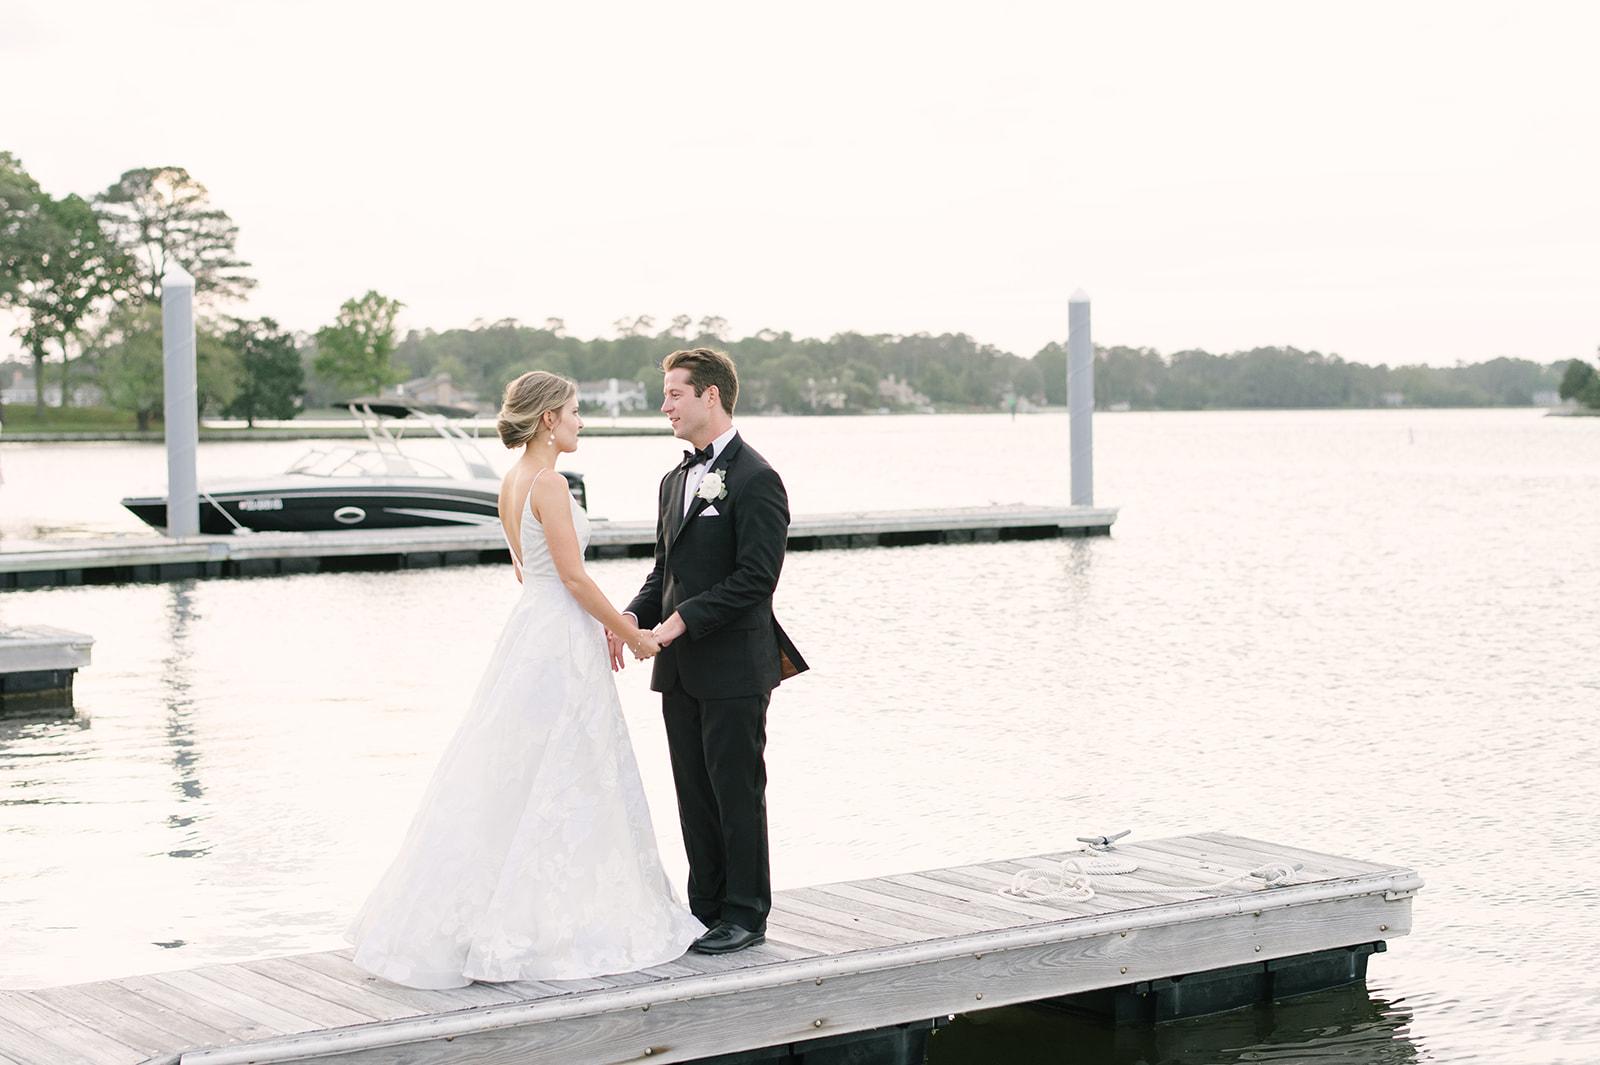 portraits-boland-sarah-street-photography-97.jpgCourtney Inghram Cavalier Virginia Beach Wedding Florist Southern and Coastal Wedding